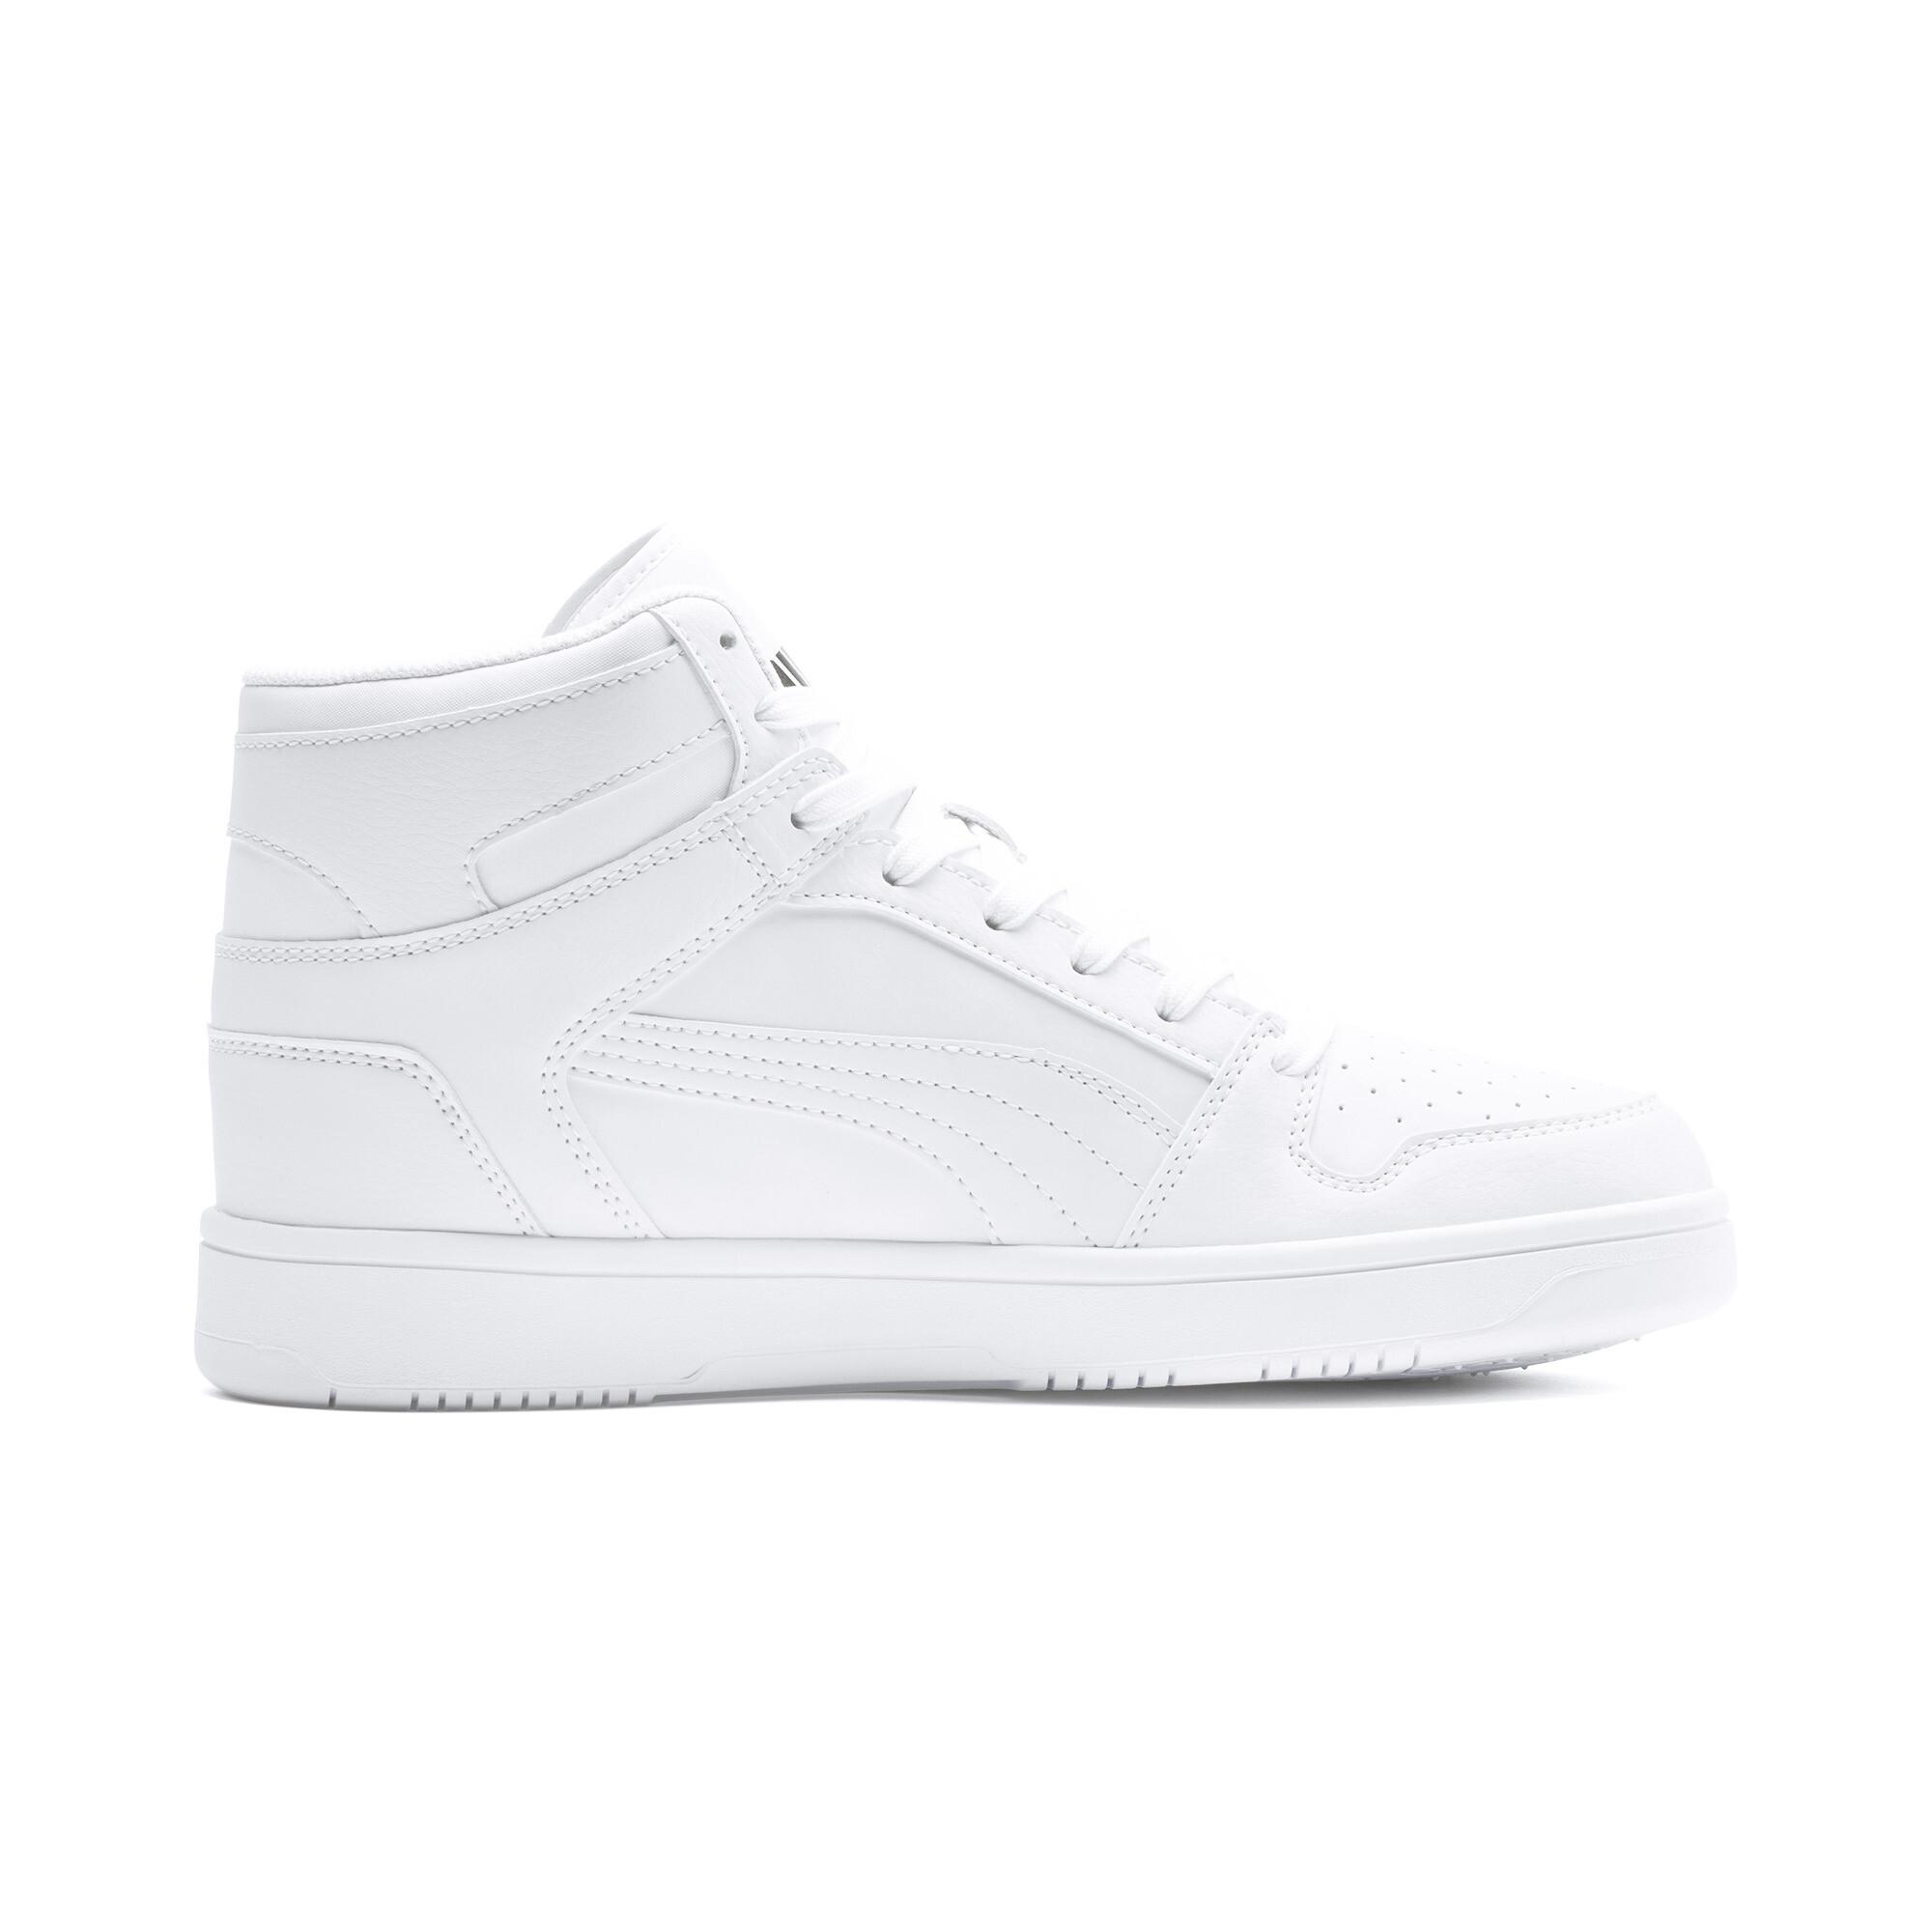 PUMA-PUMA-Rebound-LayUp-Men-039-s-Sneakers-Men-Mid-Boot-Basics thumbnail 19